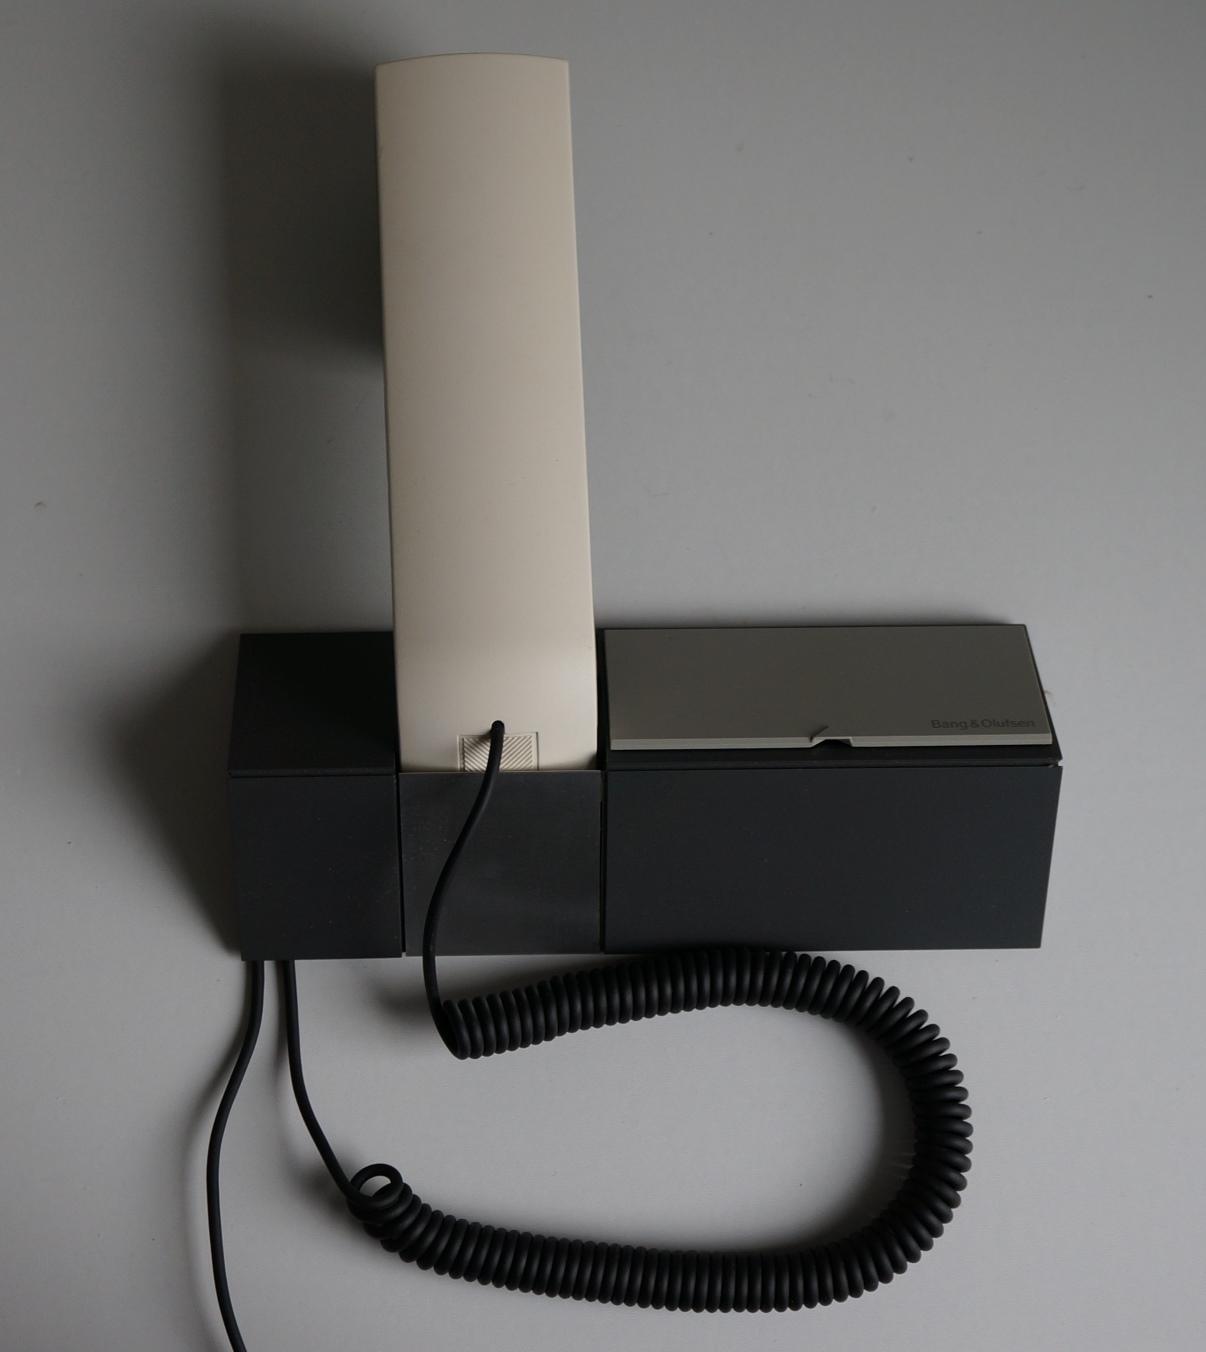 BeoCom 1500 mit Wandholder Image